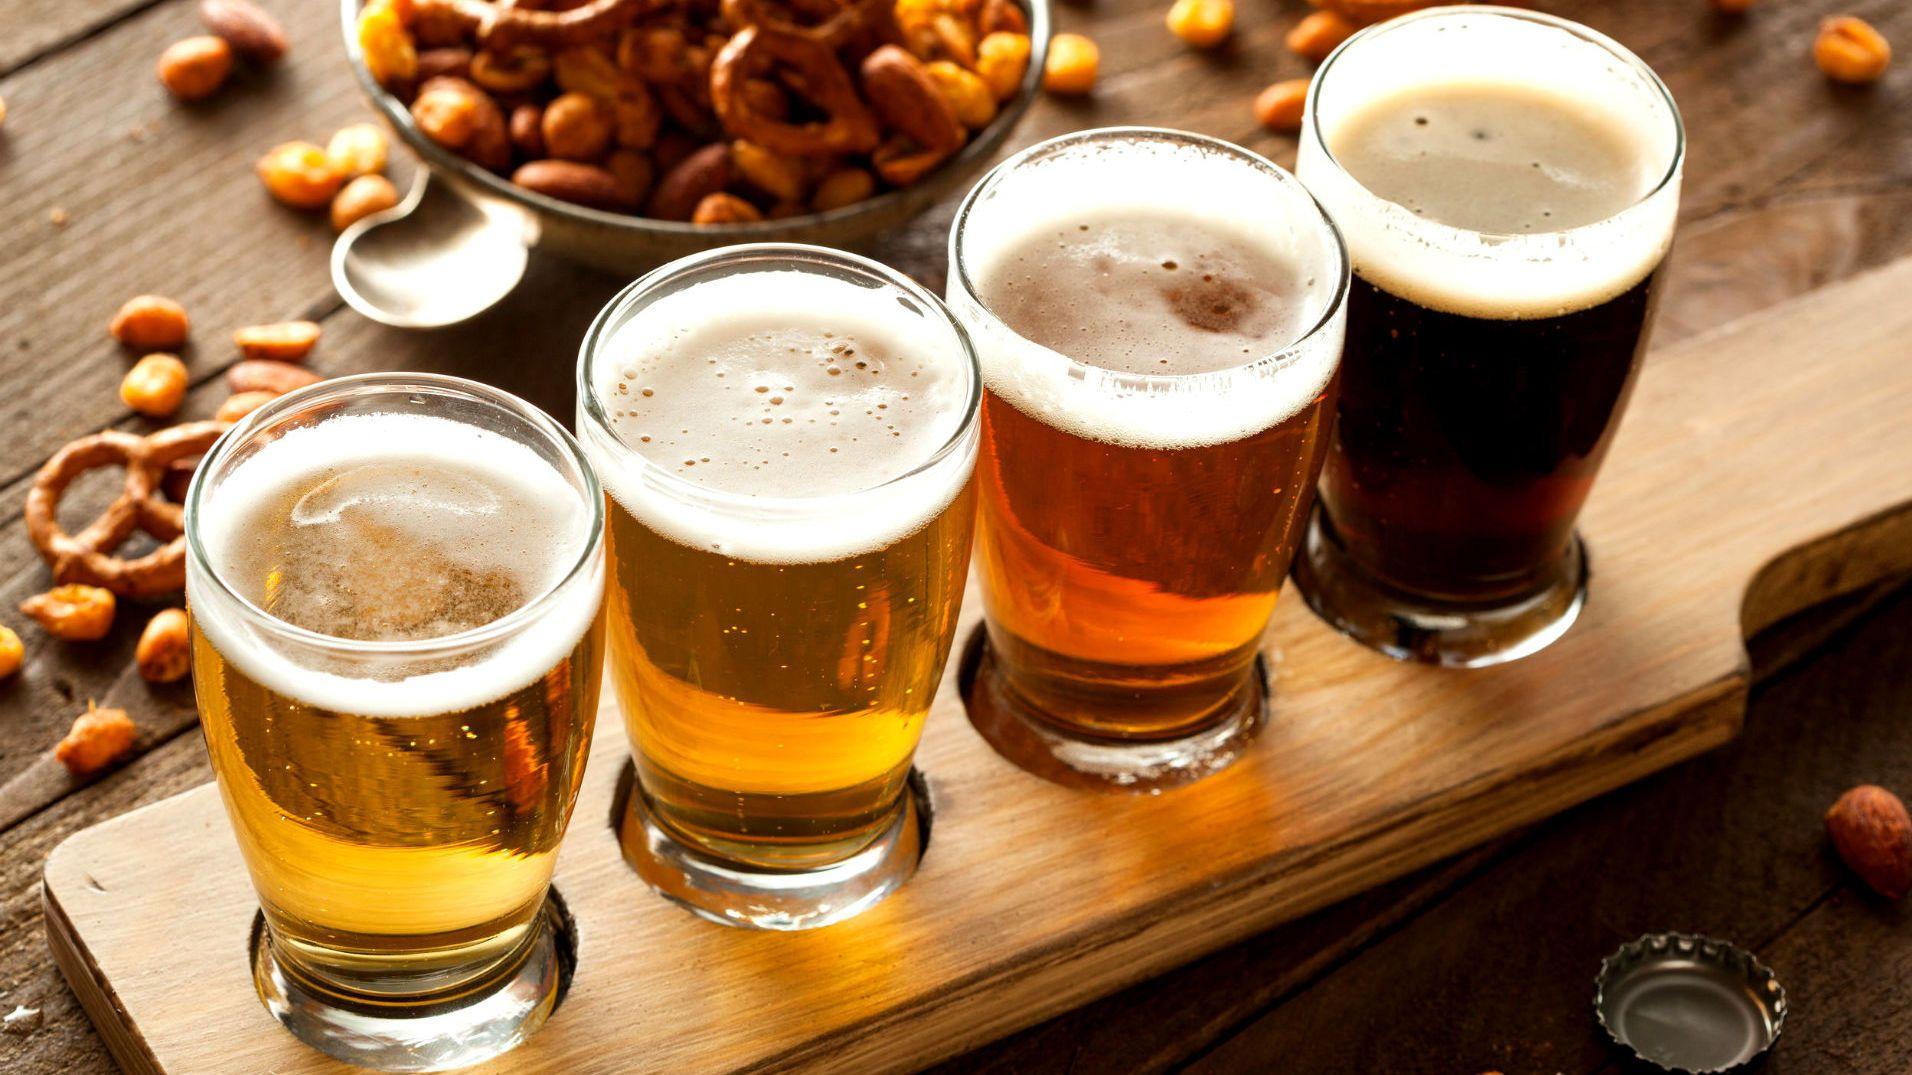 Birre artigianali italiane: la nostra top 10